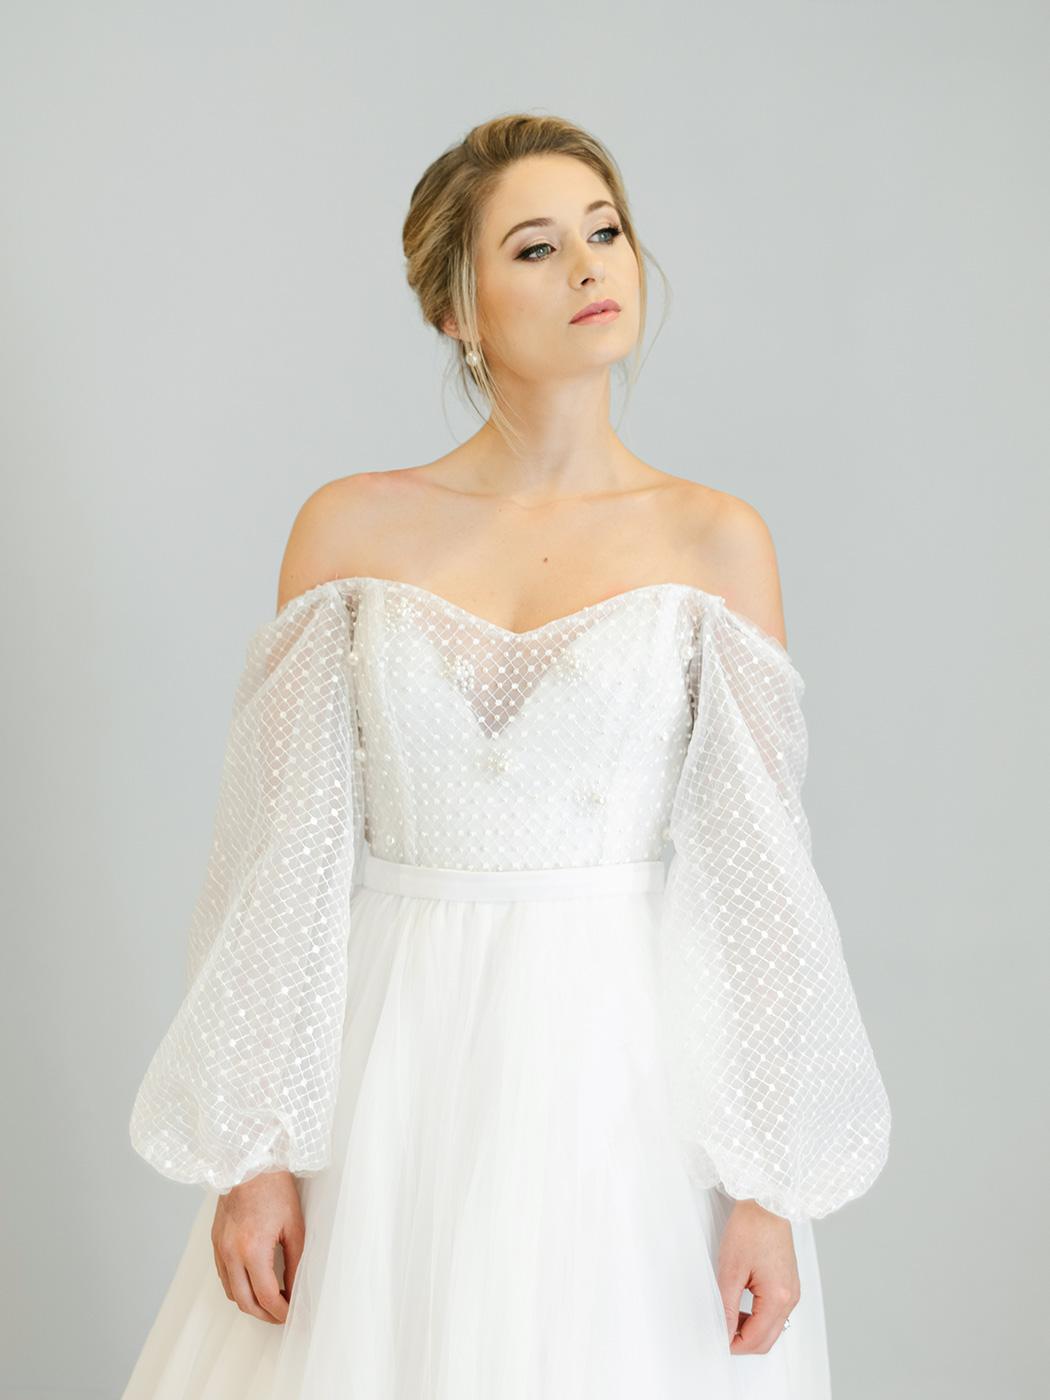 Wedding Dress by Elli-Nicole Bridal | Rensche Mari